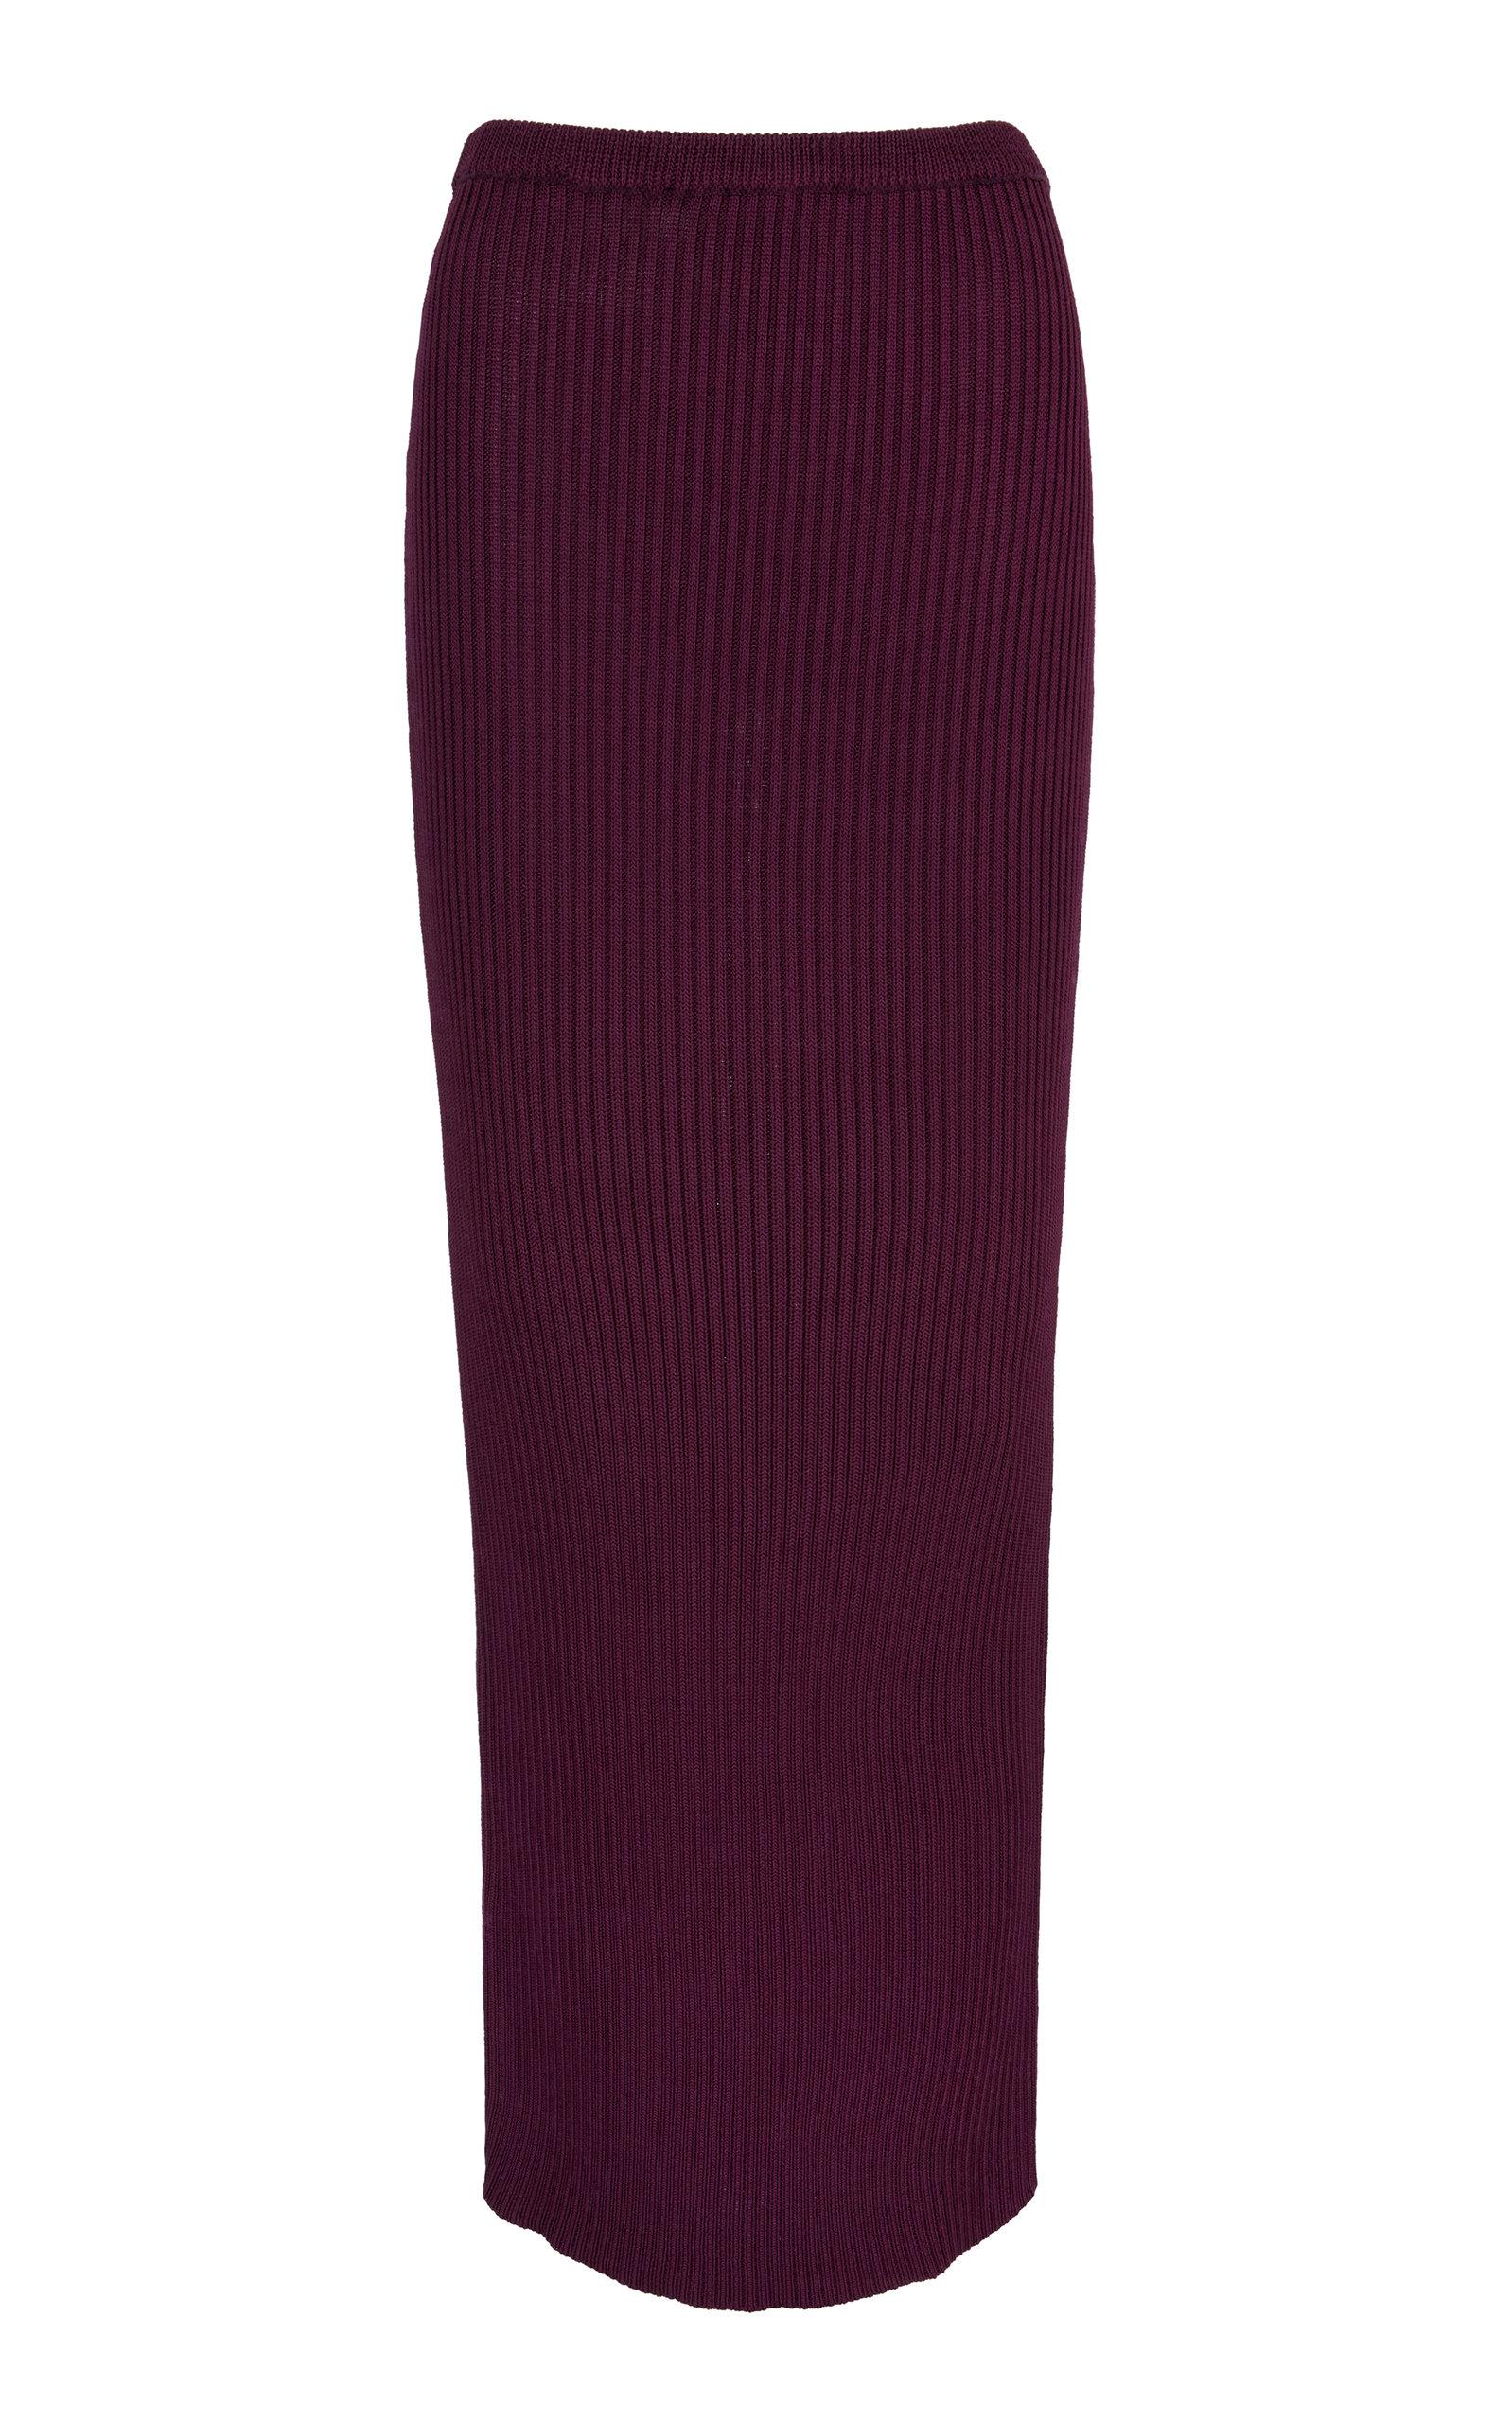 Women's Amethyst Ribbed Maxi Skirt